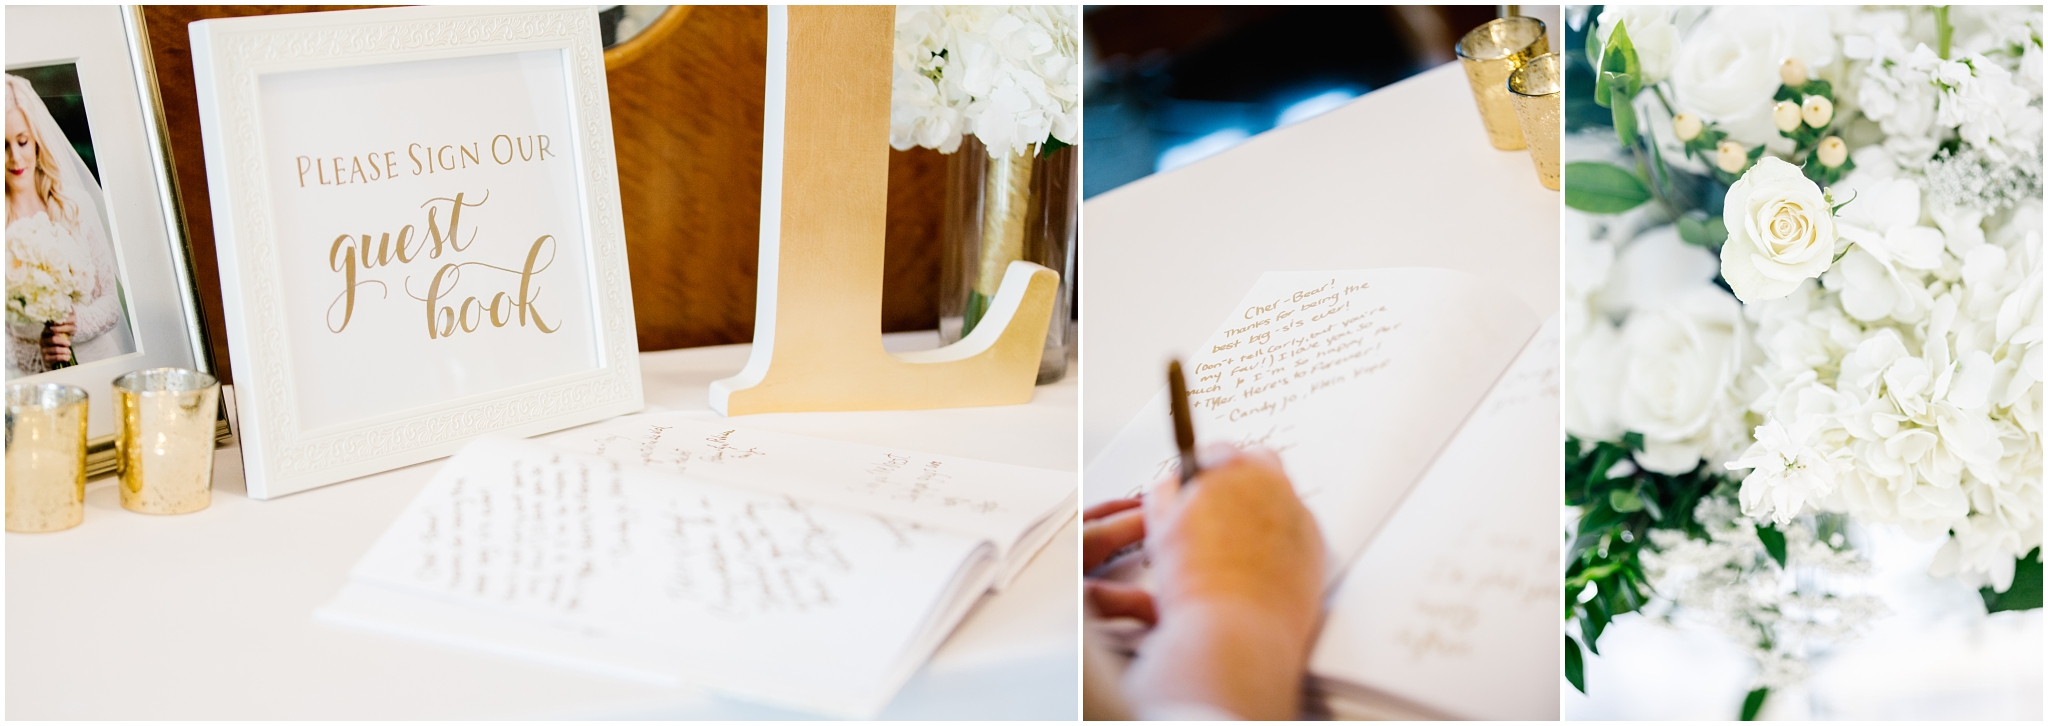 CherylandTyler-506_Lizzie-B-Imagery-Utah-Wedding-Photographer-Salt-Lake-City-Temple-Wells-Fargo-Building-Reception.jpg